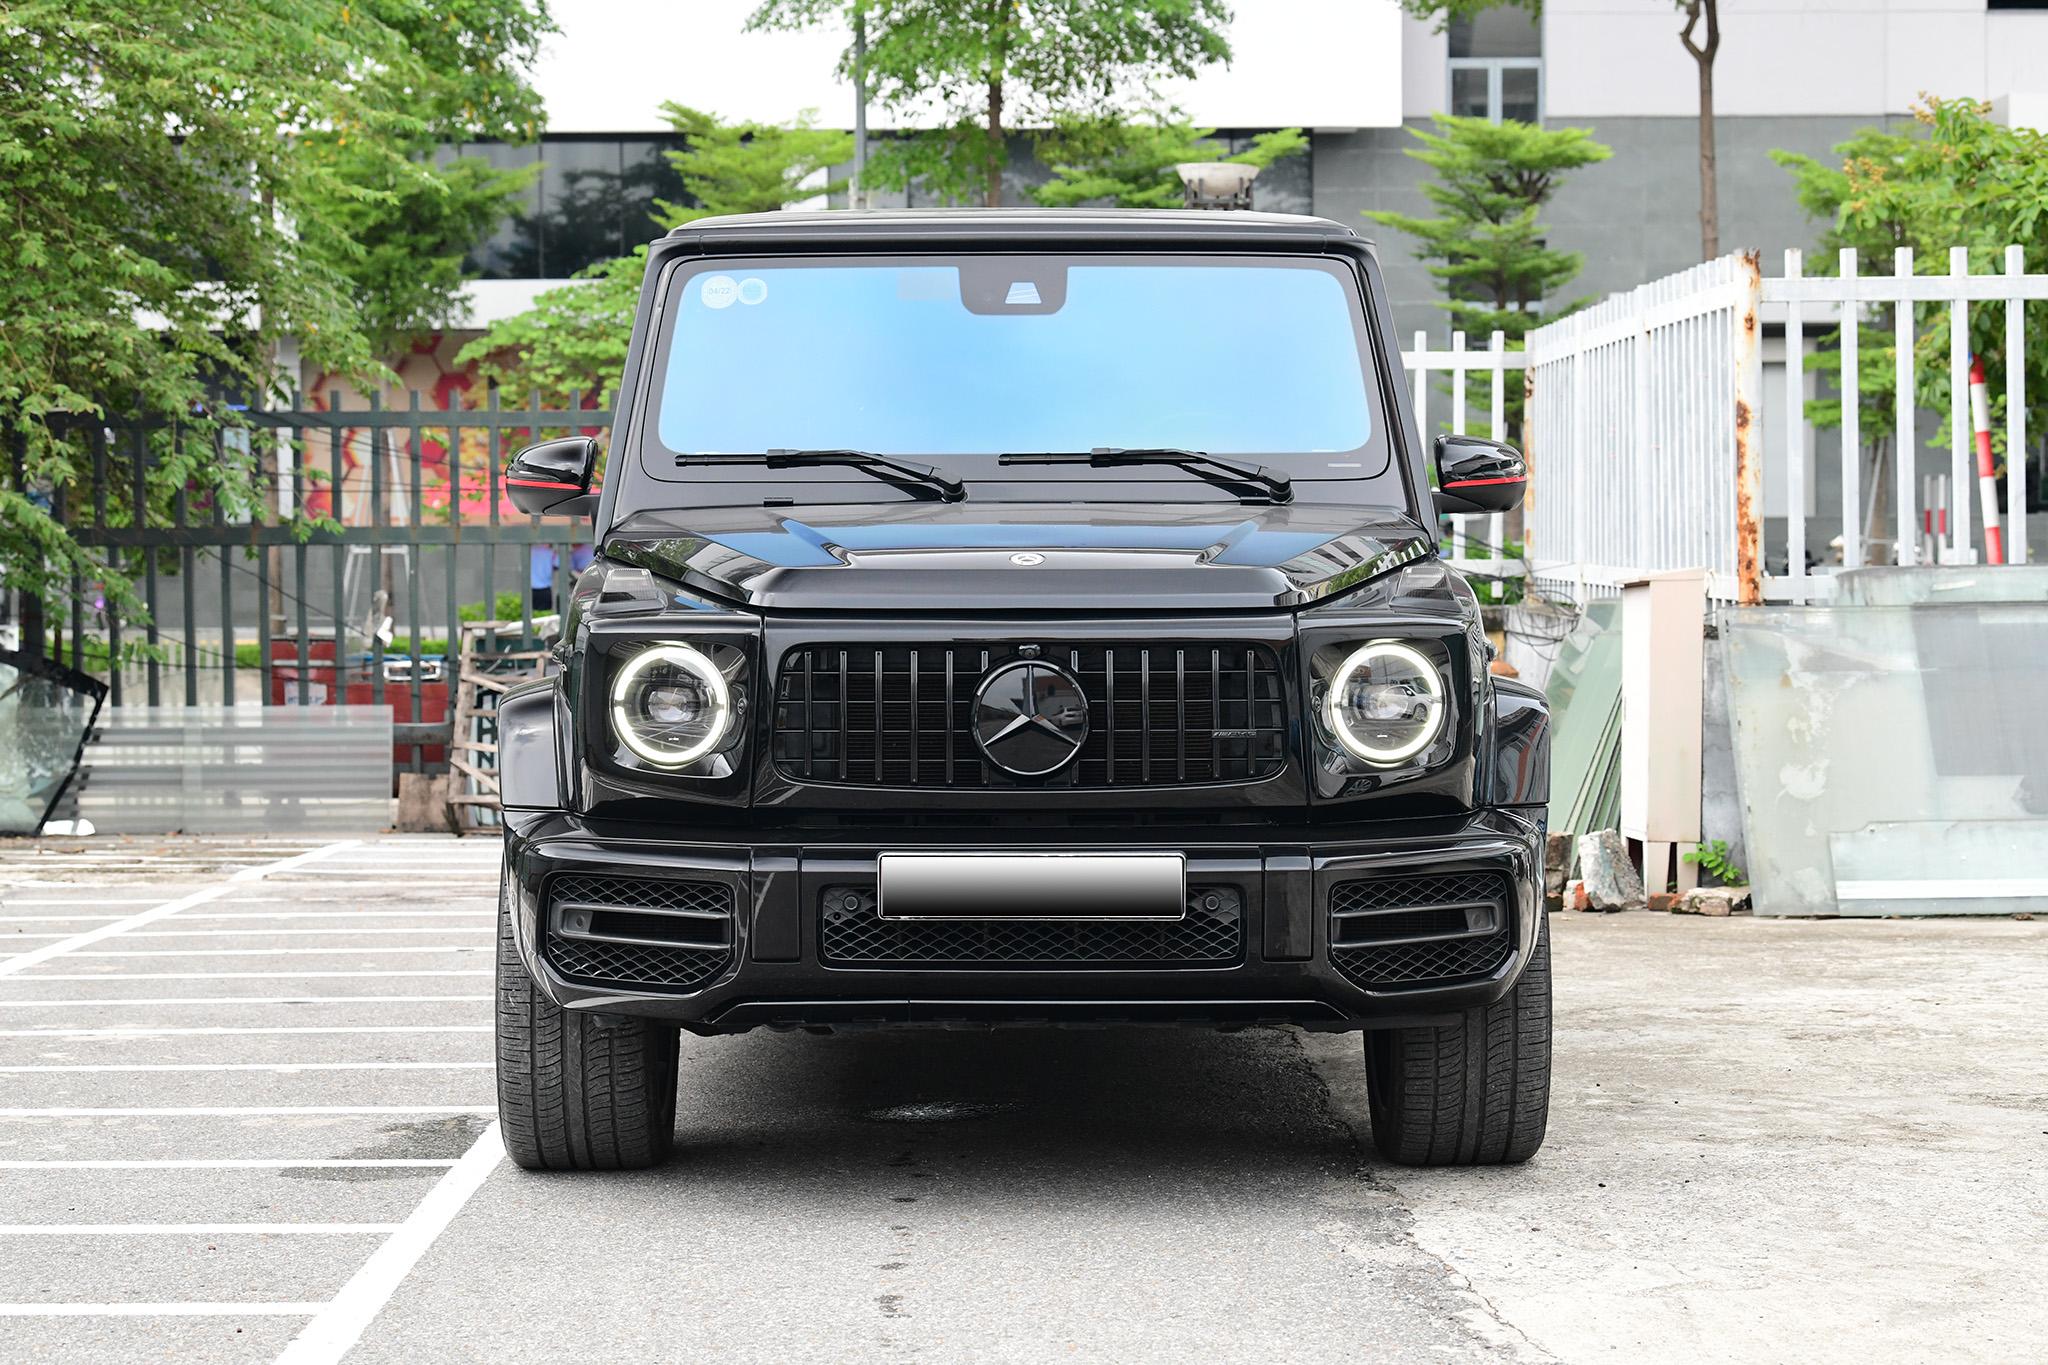 MERCEDES BENZ G63 AMG EDITION ONE 2019